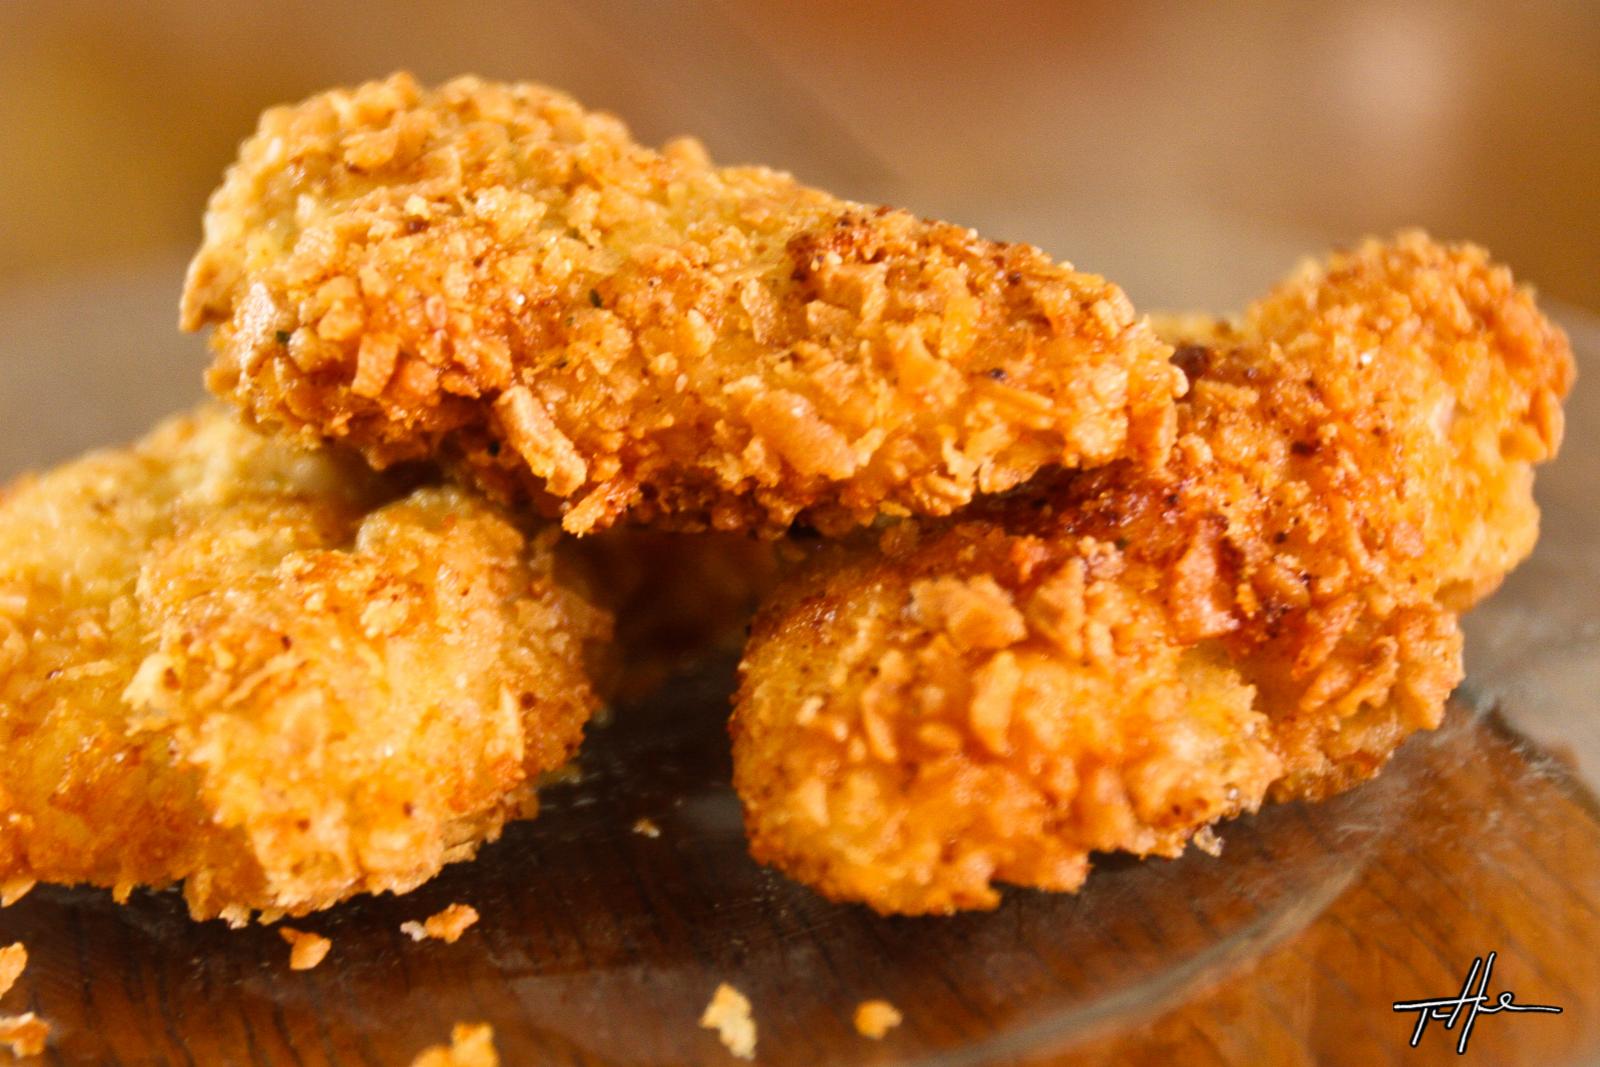 A Broken Shoe: Homemade Chicken Nuggets